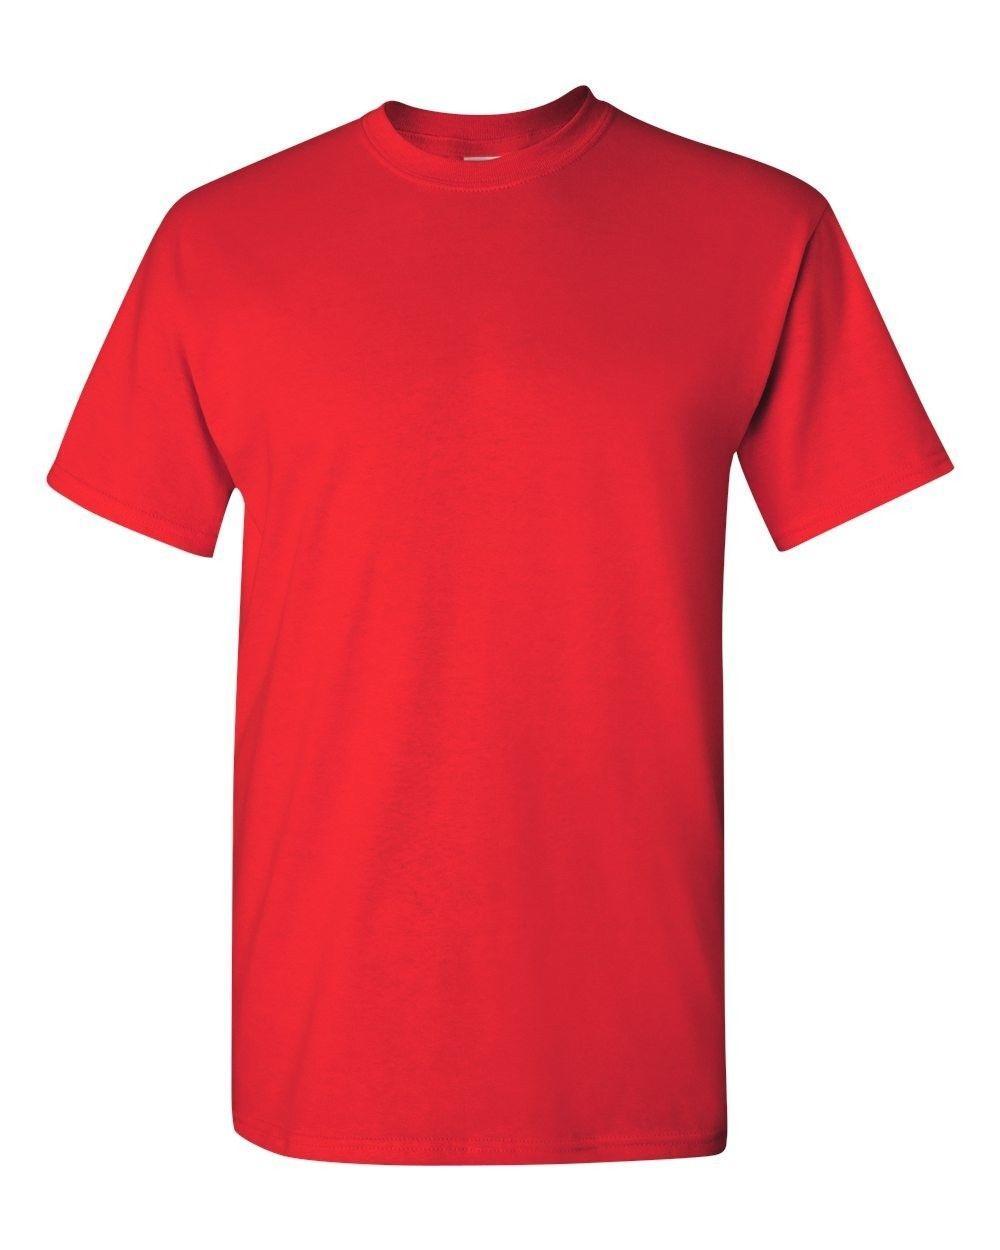 Men's Cotton Short Sleeve T-Shirt Tee Close Out Solid Plain Tshirt Various Brand